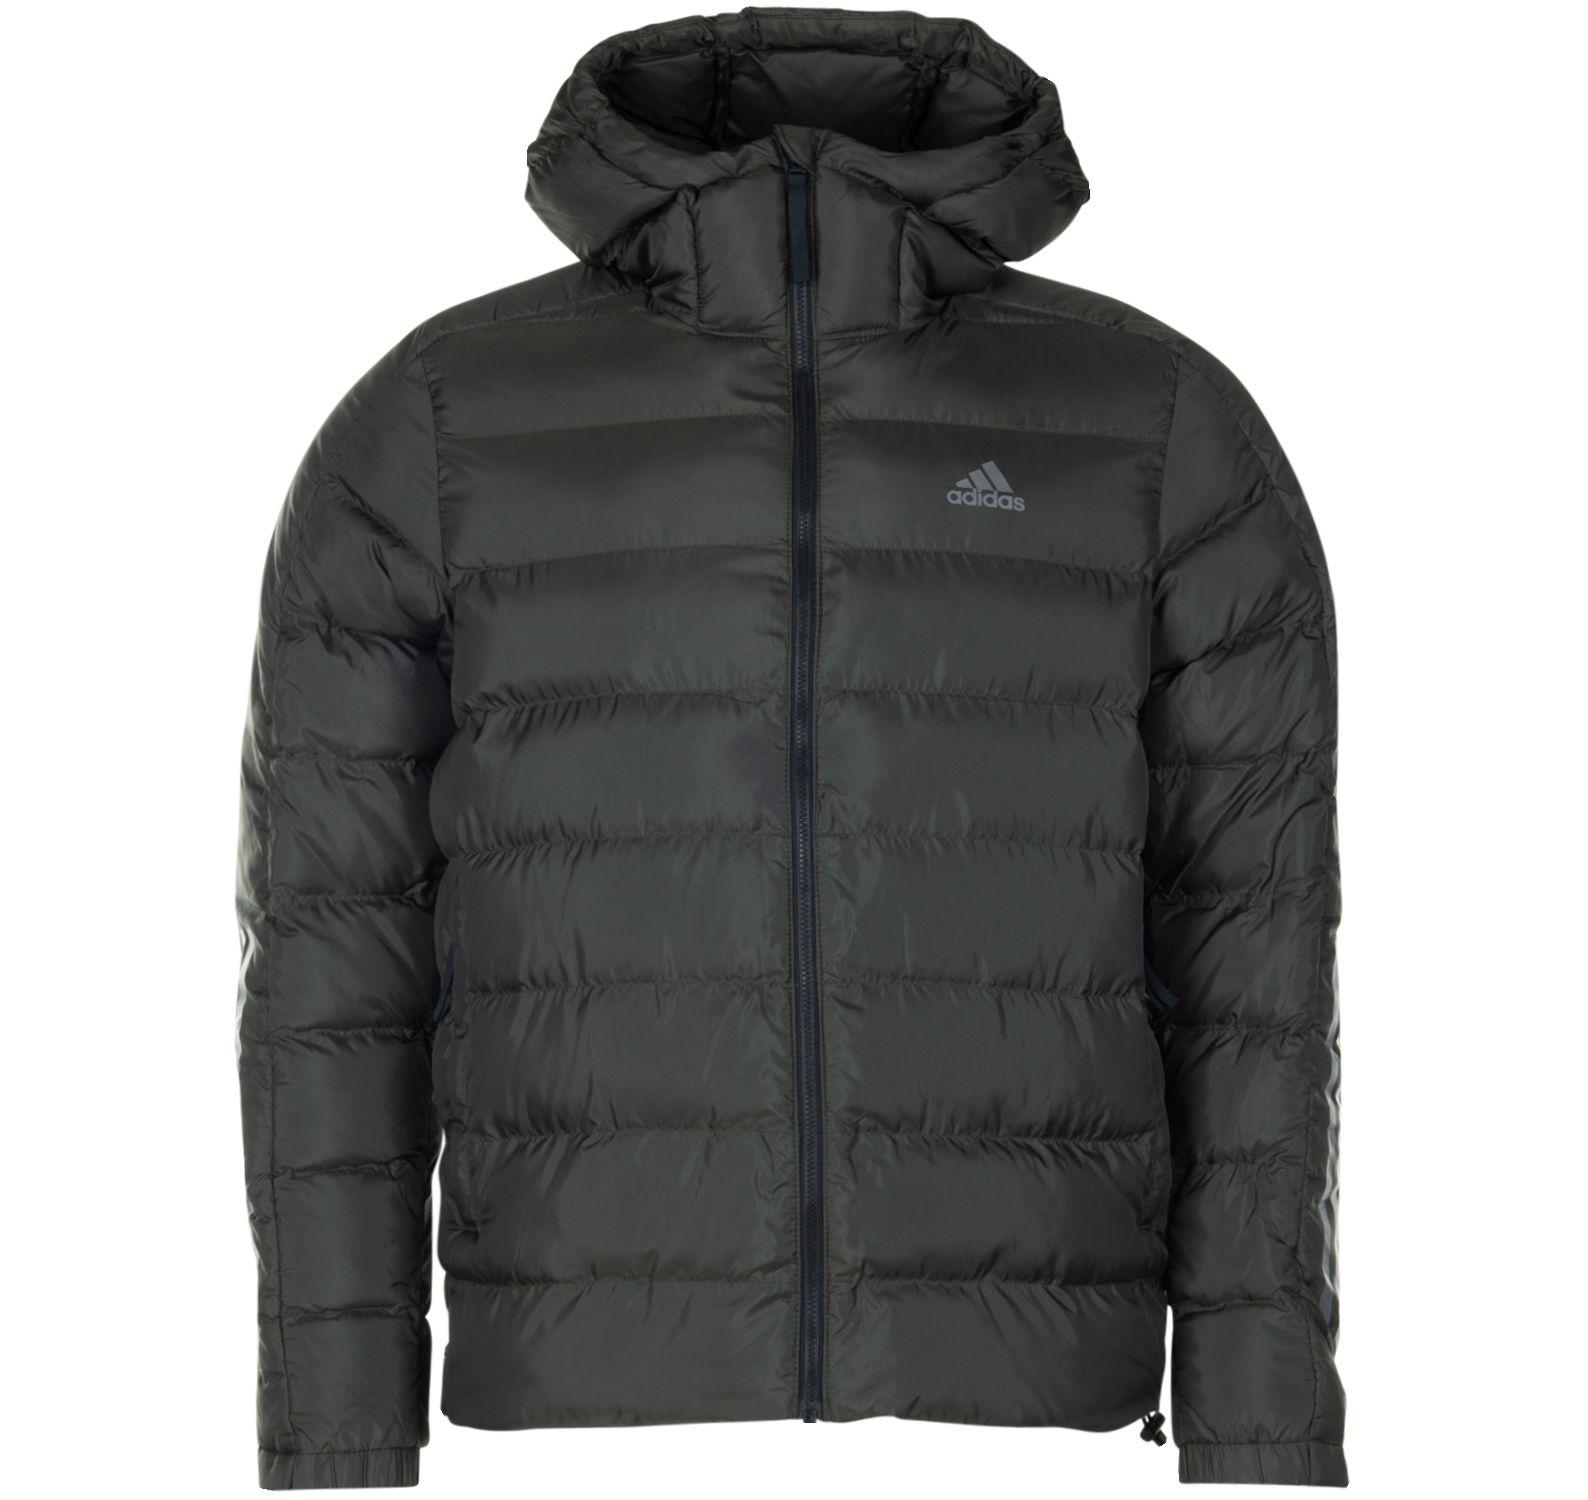 Itavic 3s 2.0 J, Legear, L,  Adidas Kläder